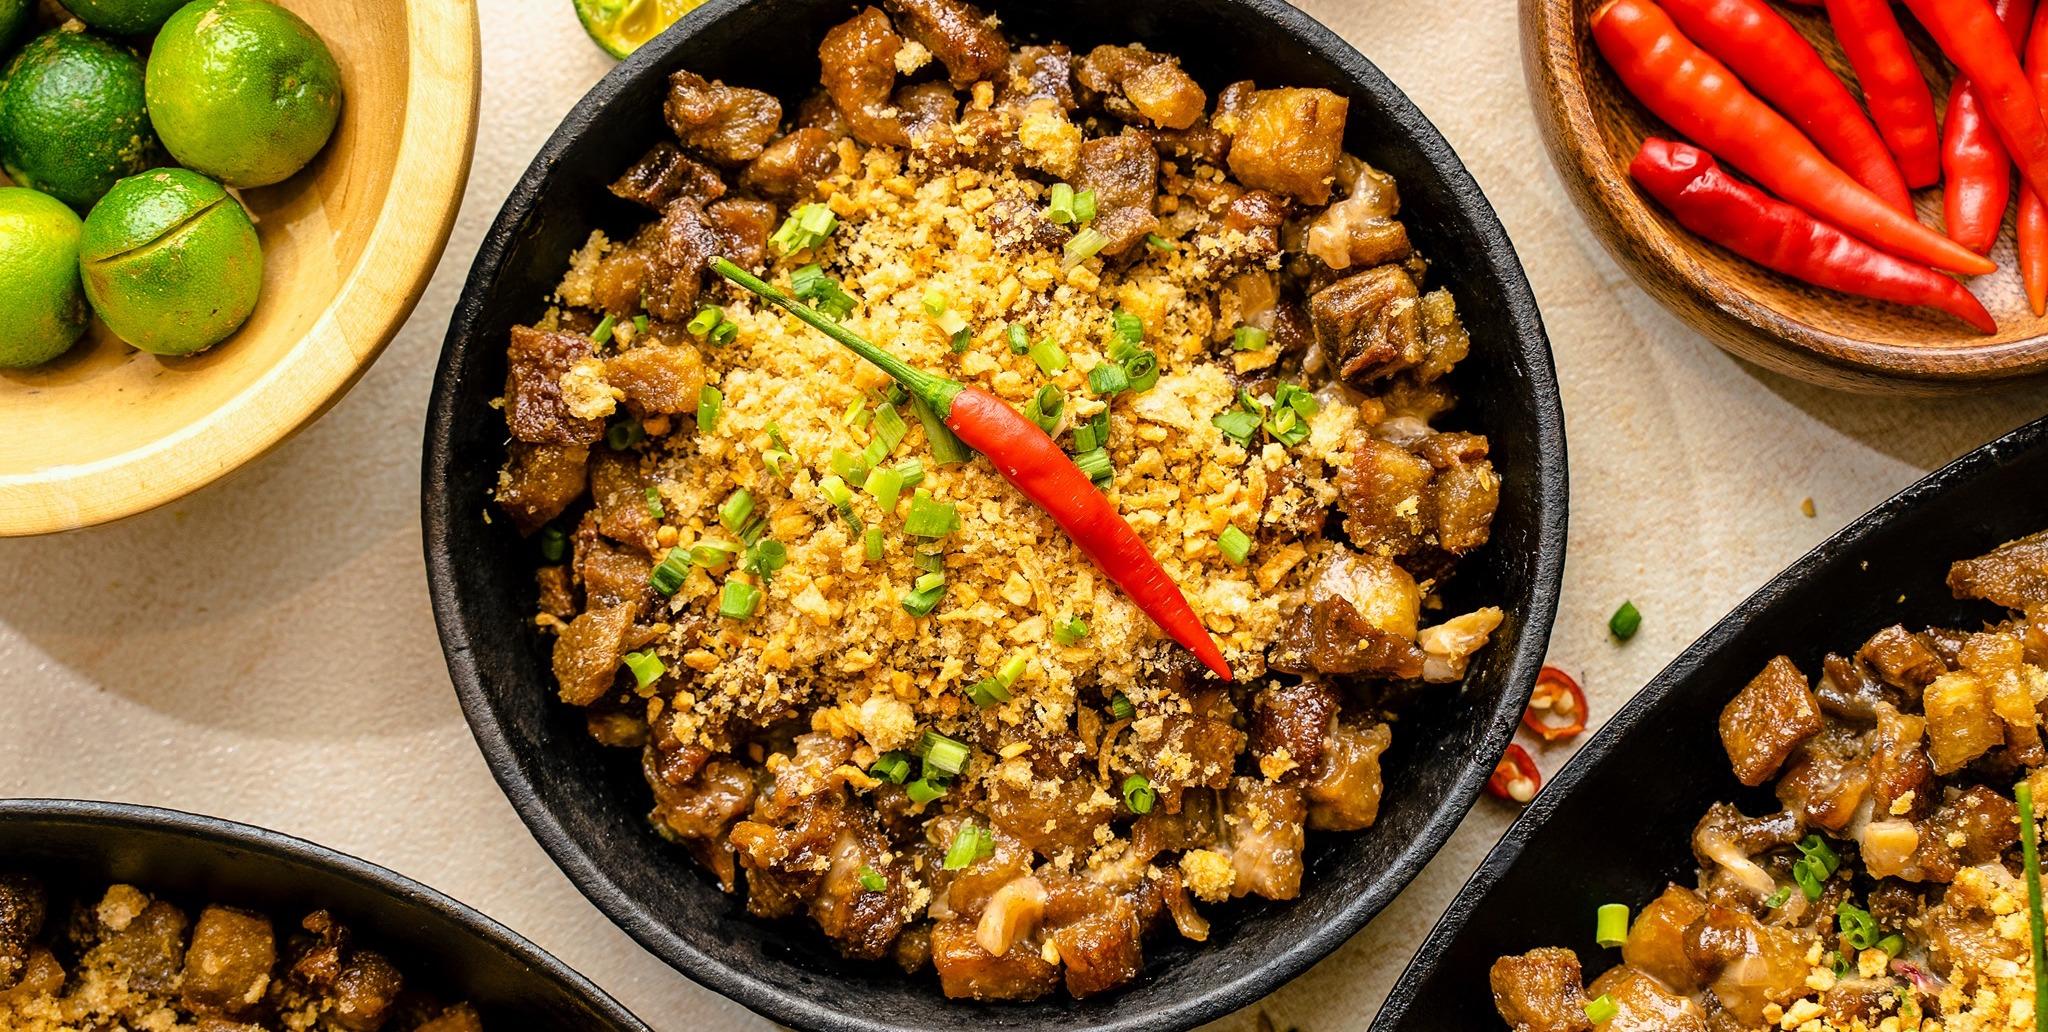 Finding the best Filipino food restaurant